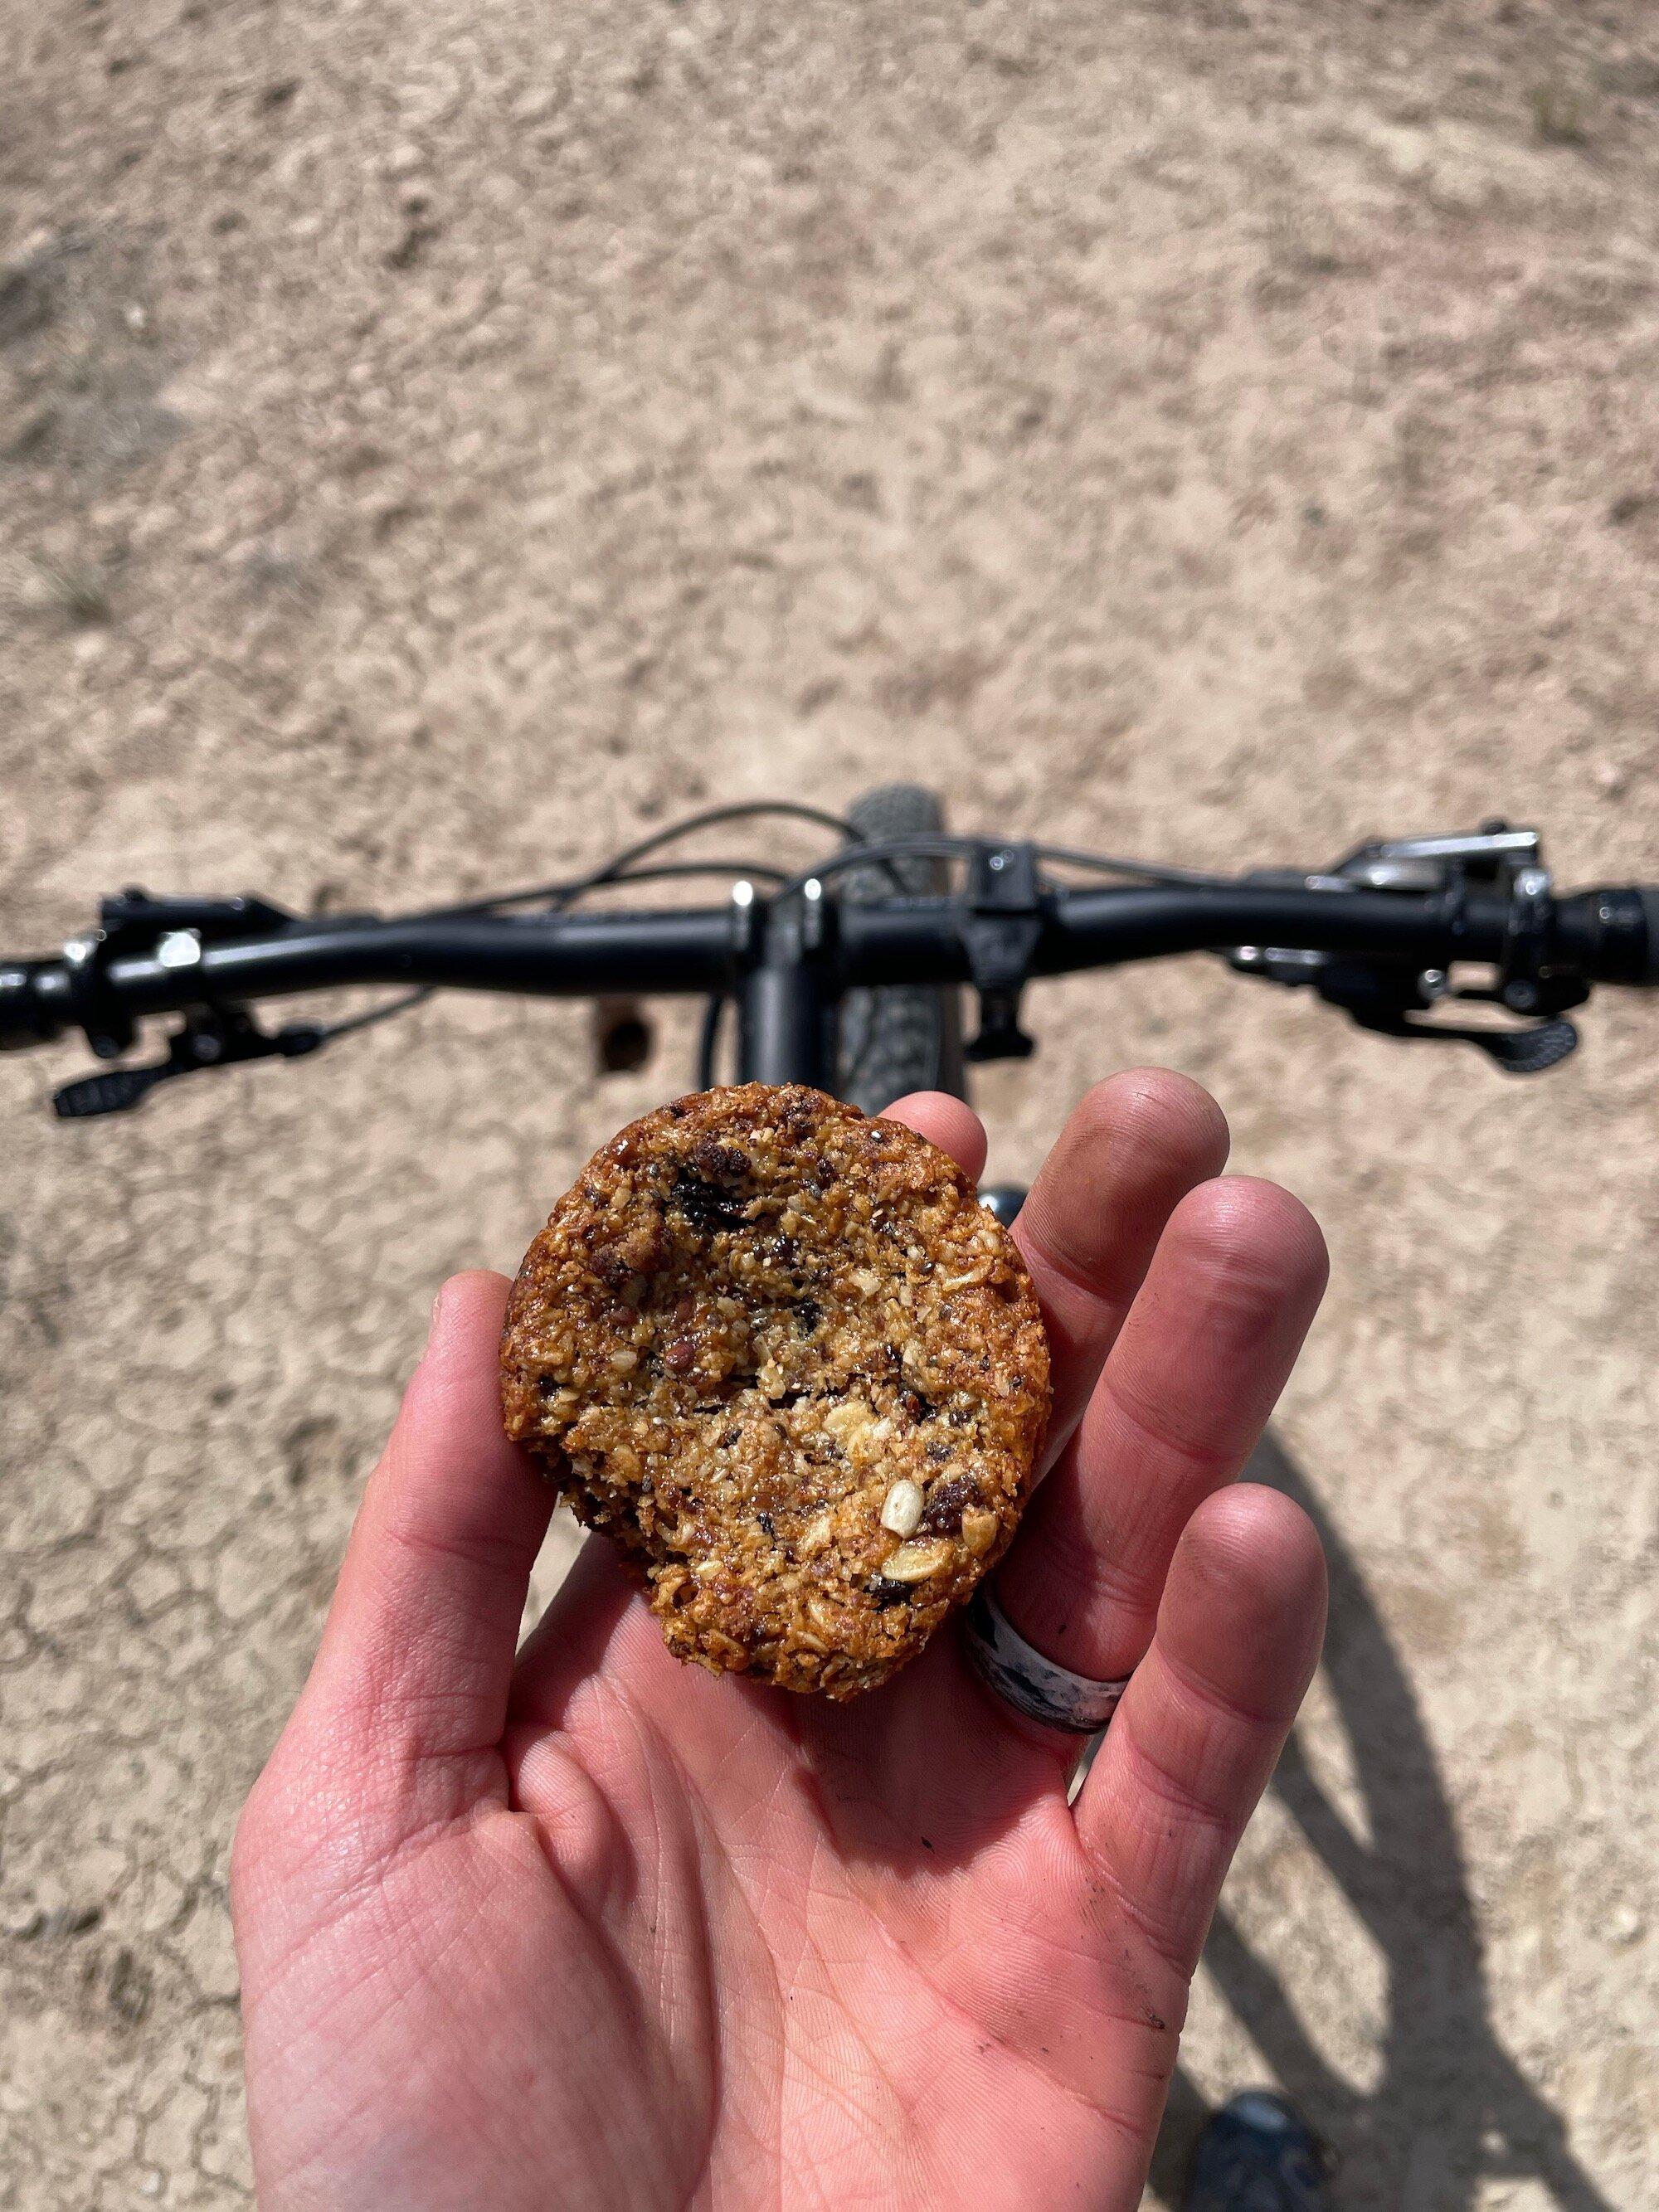 Enjoying an aussie bite on my bike in Eagle, CO